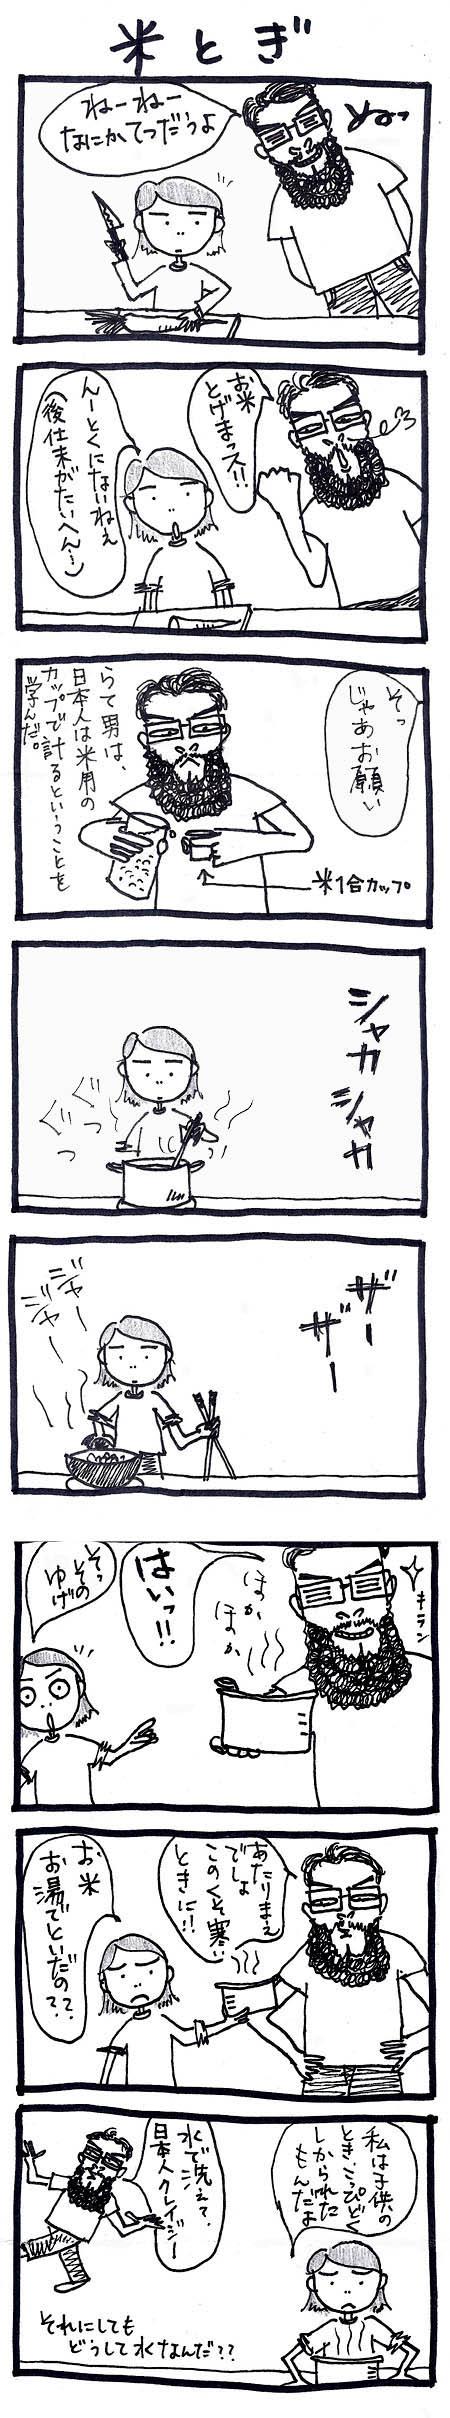 wash rice 1